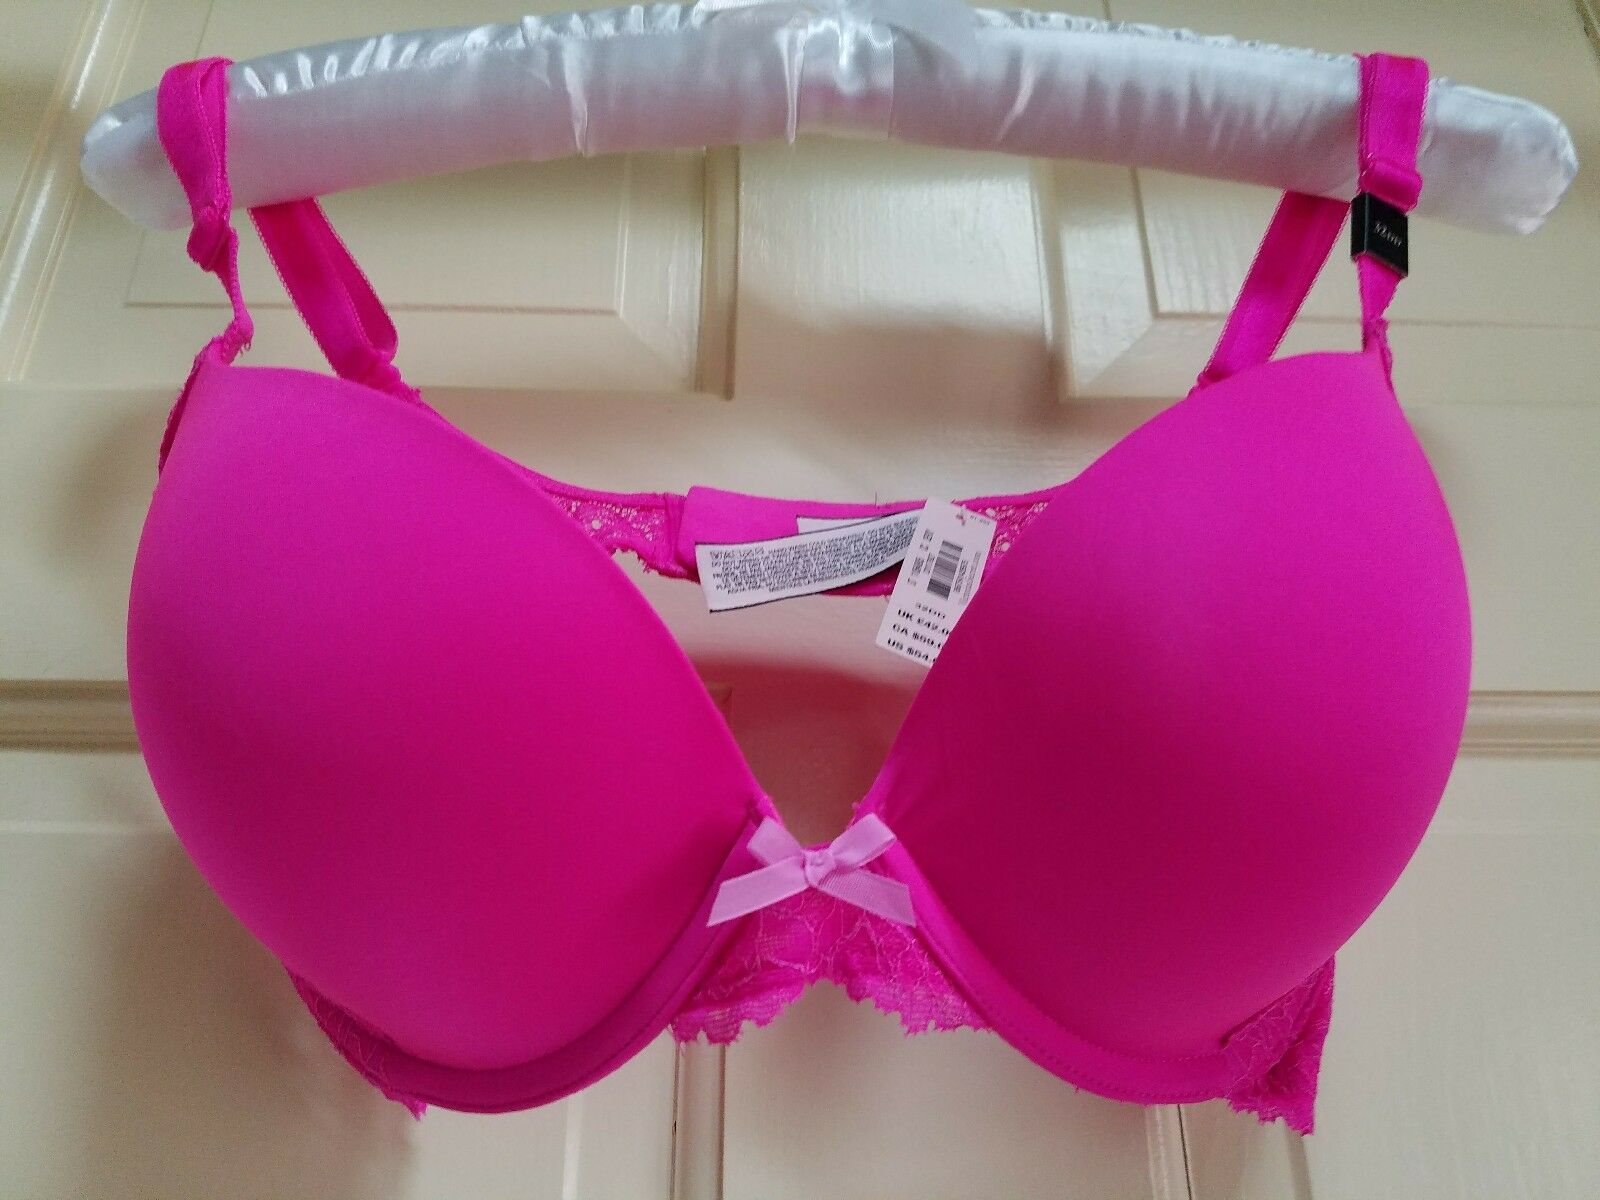 VICTORIA'S SECRET Dream Angels pushup 32DD lace hot pink demi bra NWT